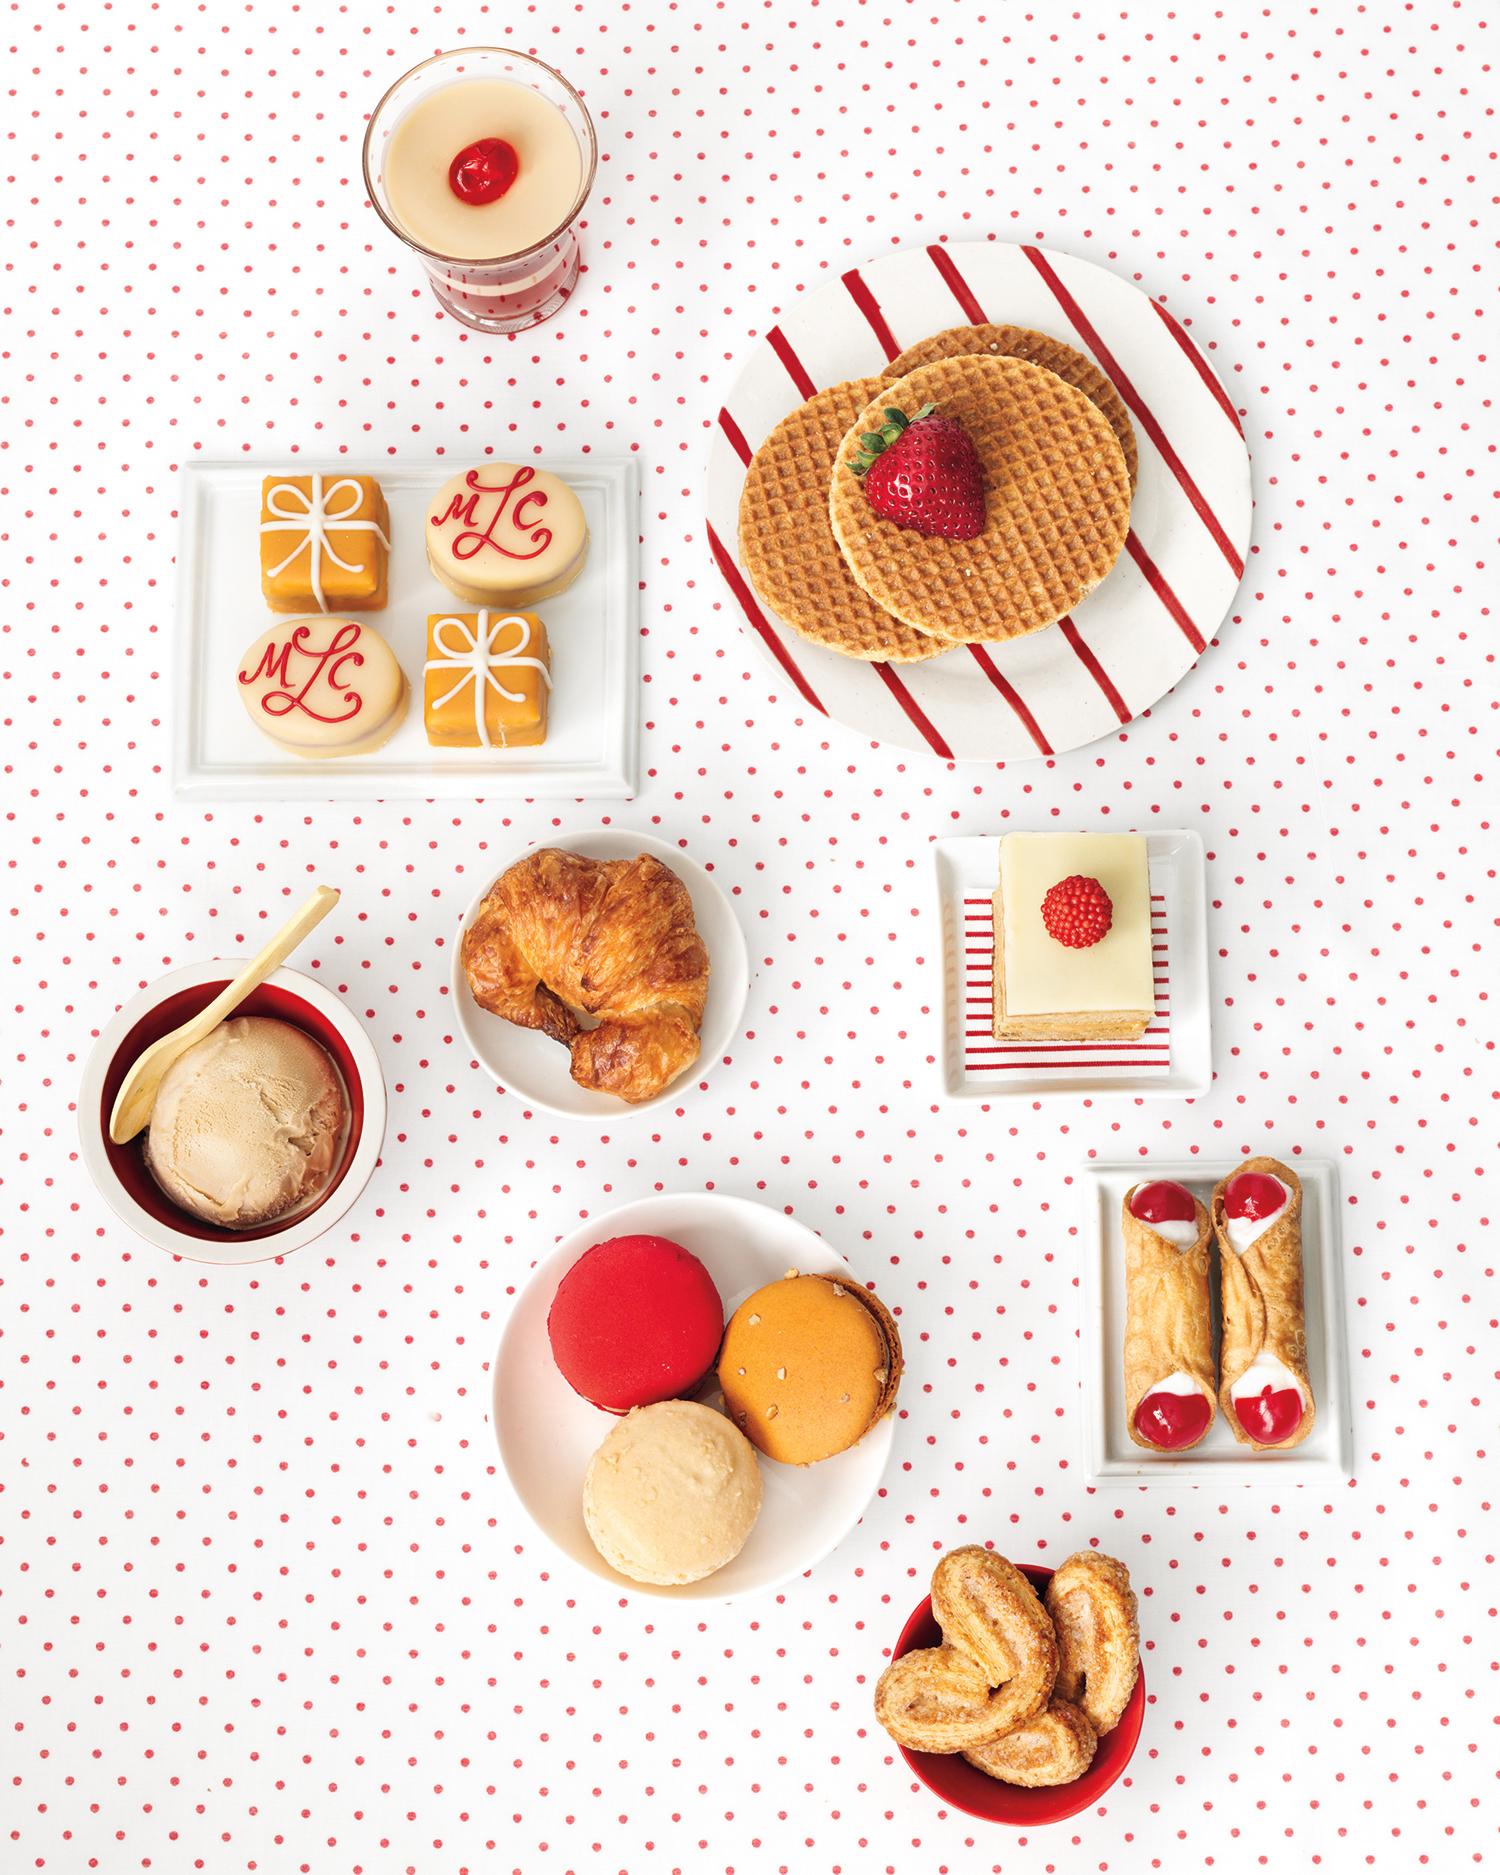 desserts-mwd108849.jpg